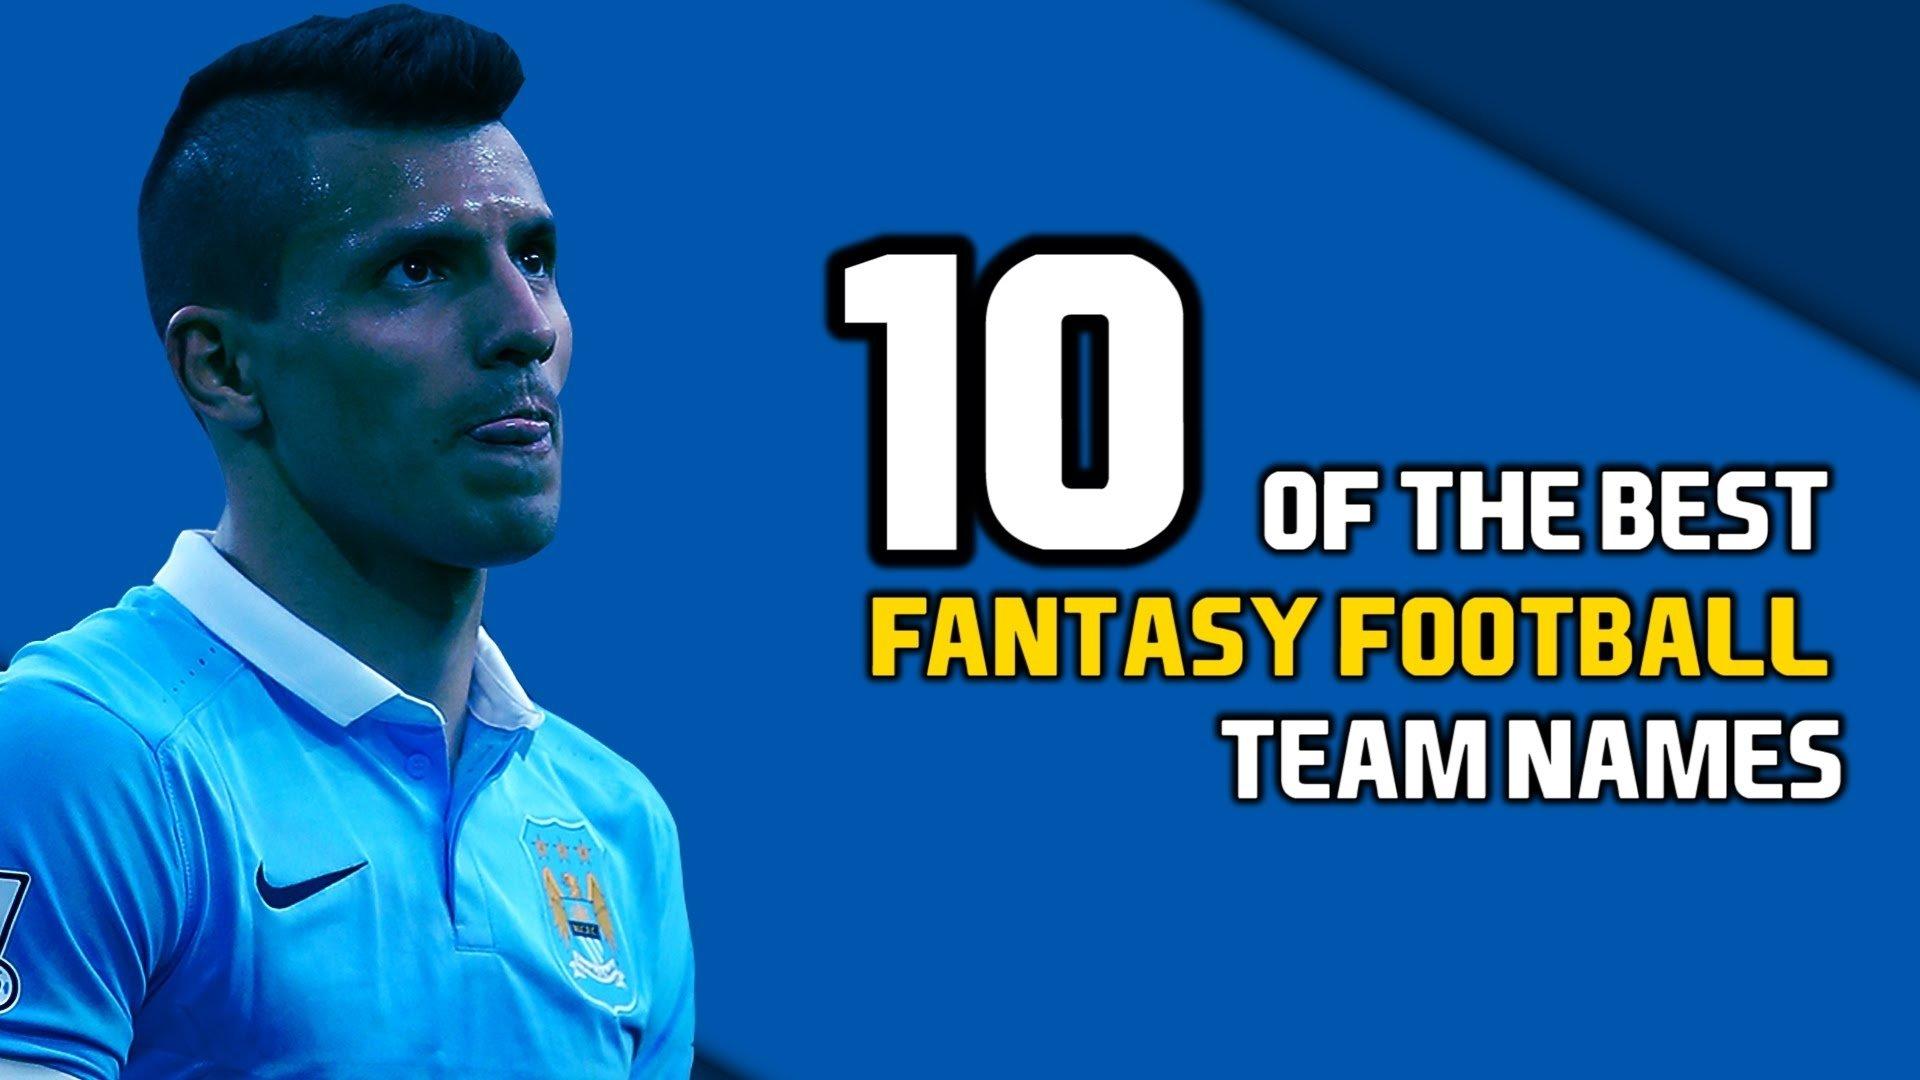 10 Unique Fantasy Football League Name Ideas 10 of the best fantasy football team names youtube 2020